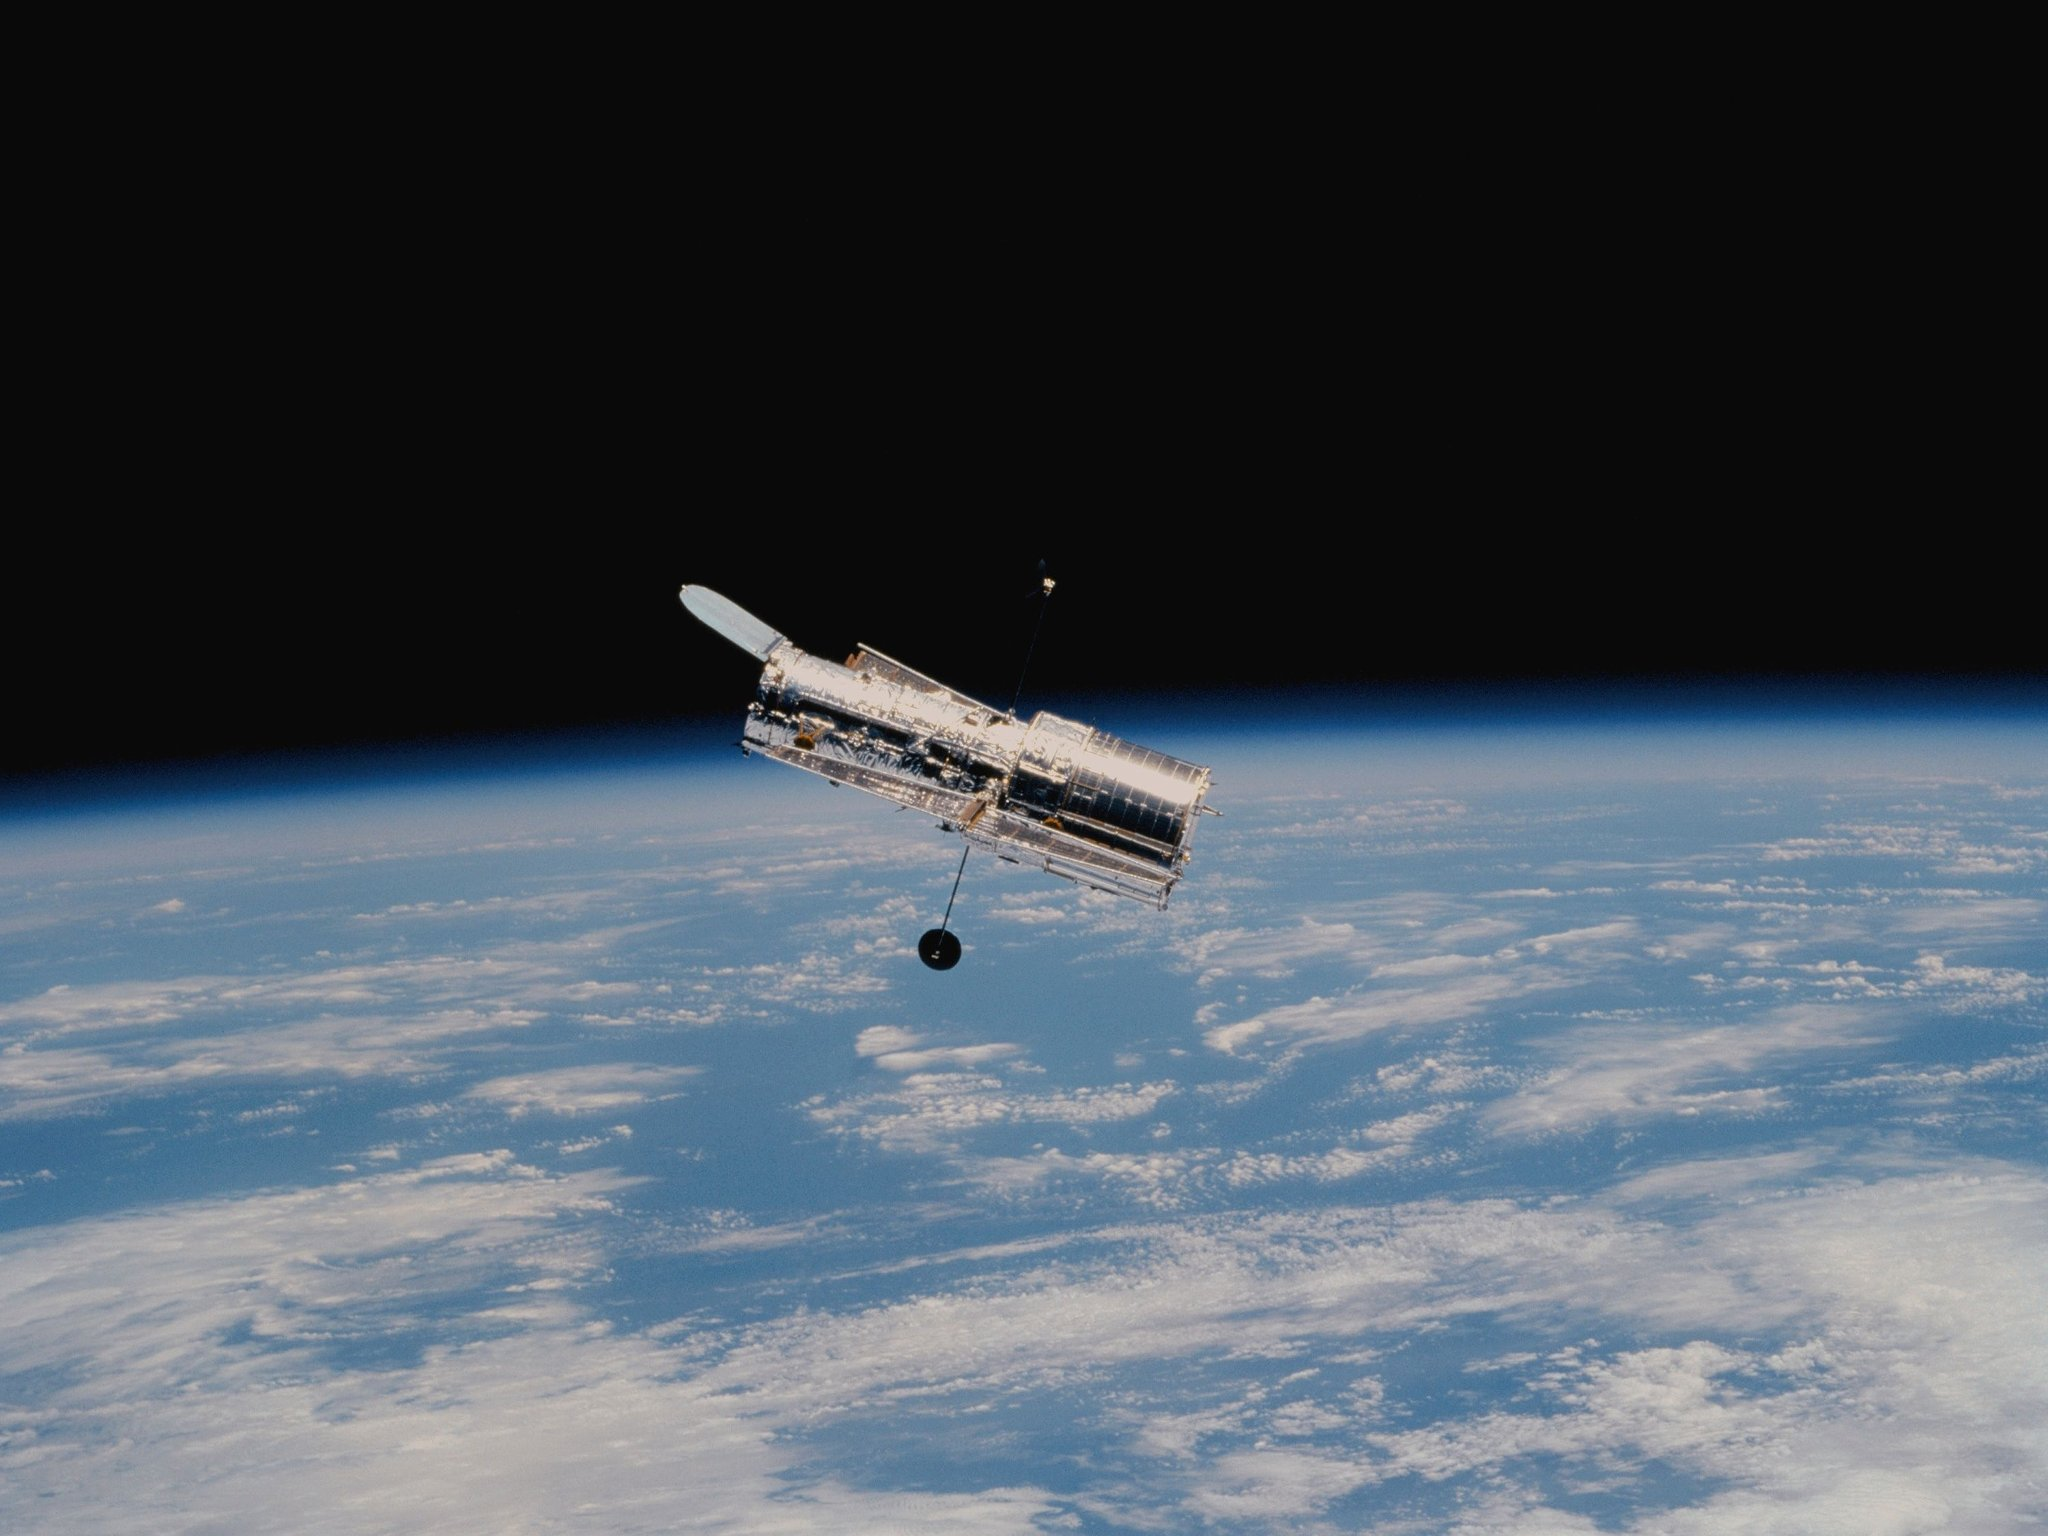 Meet The Tech Behind NASA's Insane Space Photography